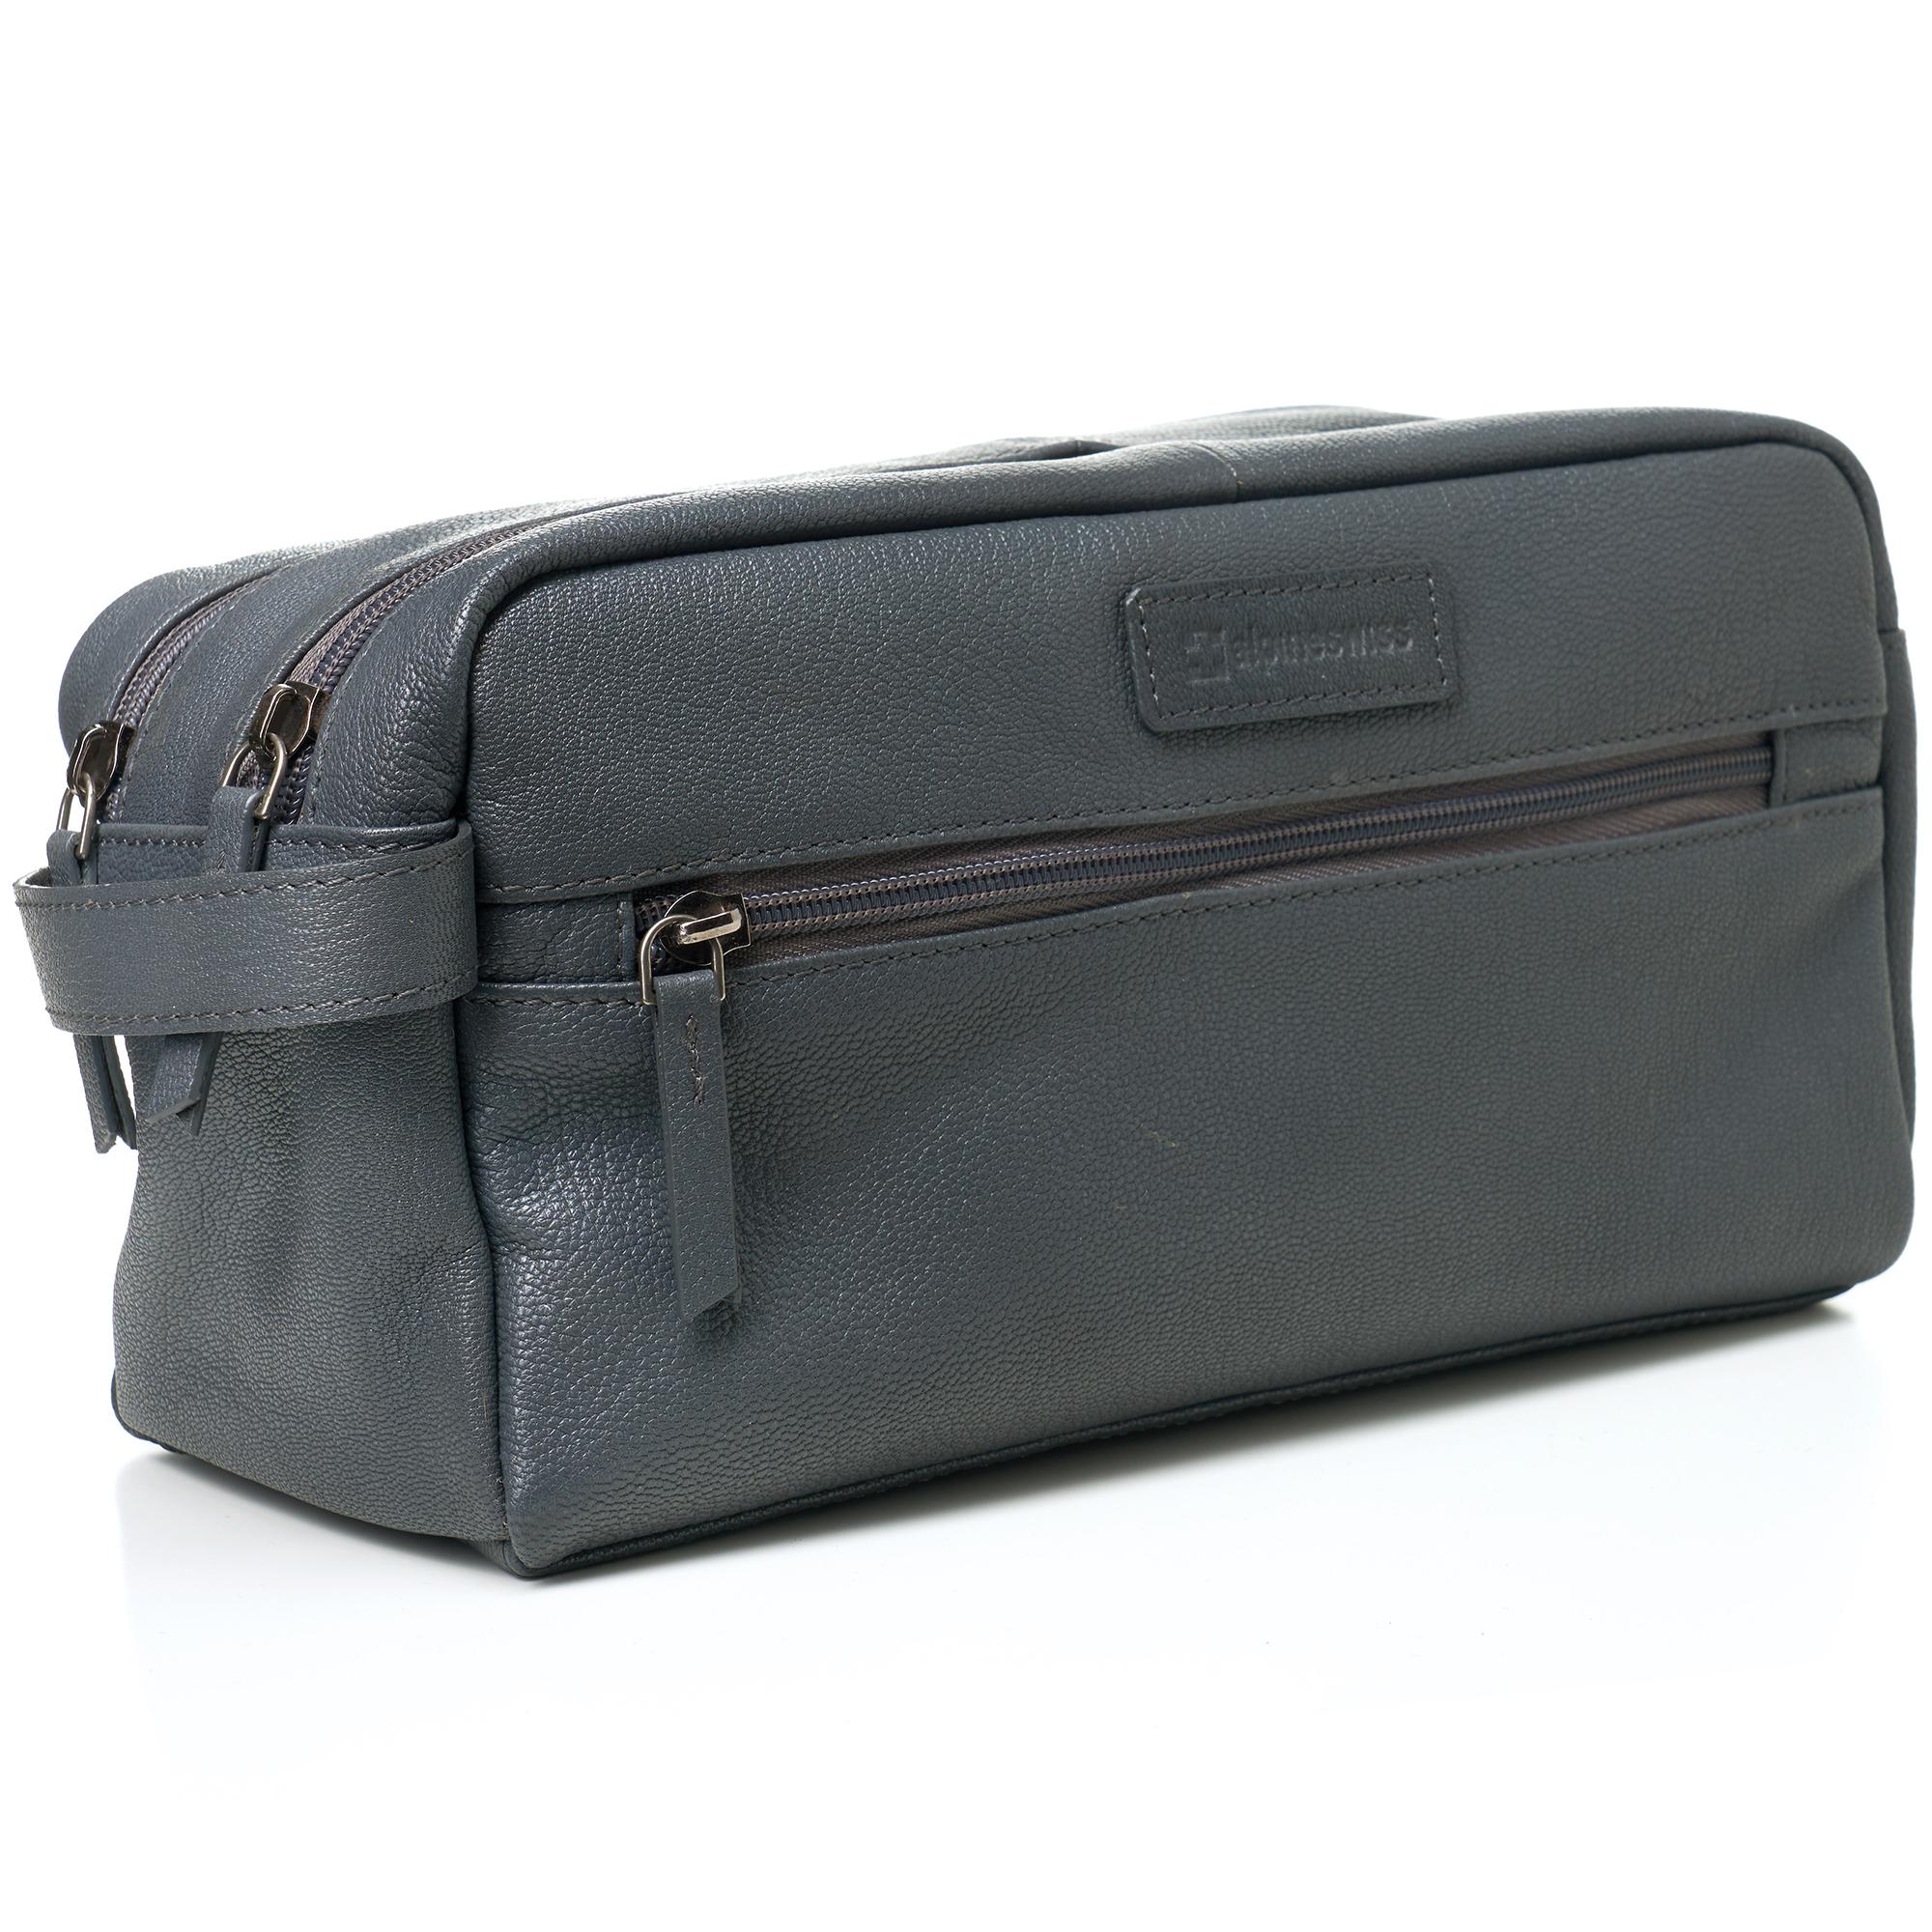 AlpineSwiss-Sedona-Toiletry-Bag-Genuine-Leather-Shaving-Kit-Dopp-Kit-Travel-Case thumbnail 26